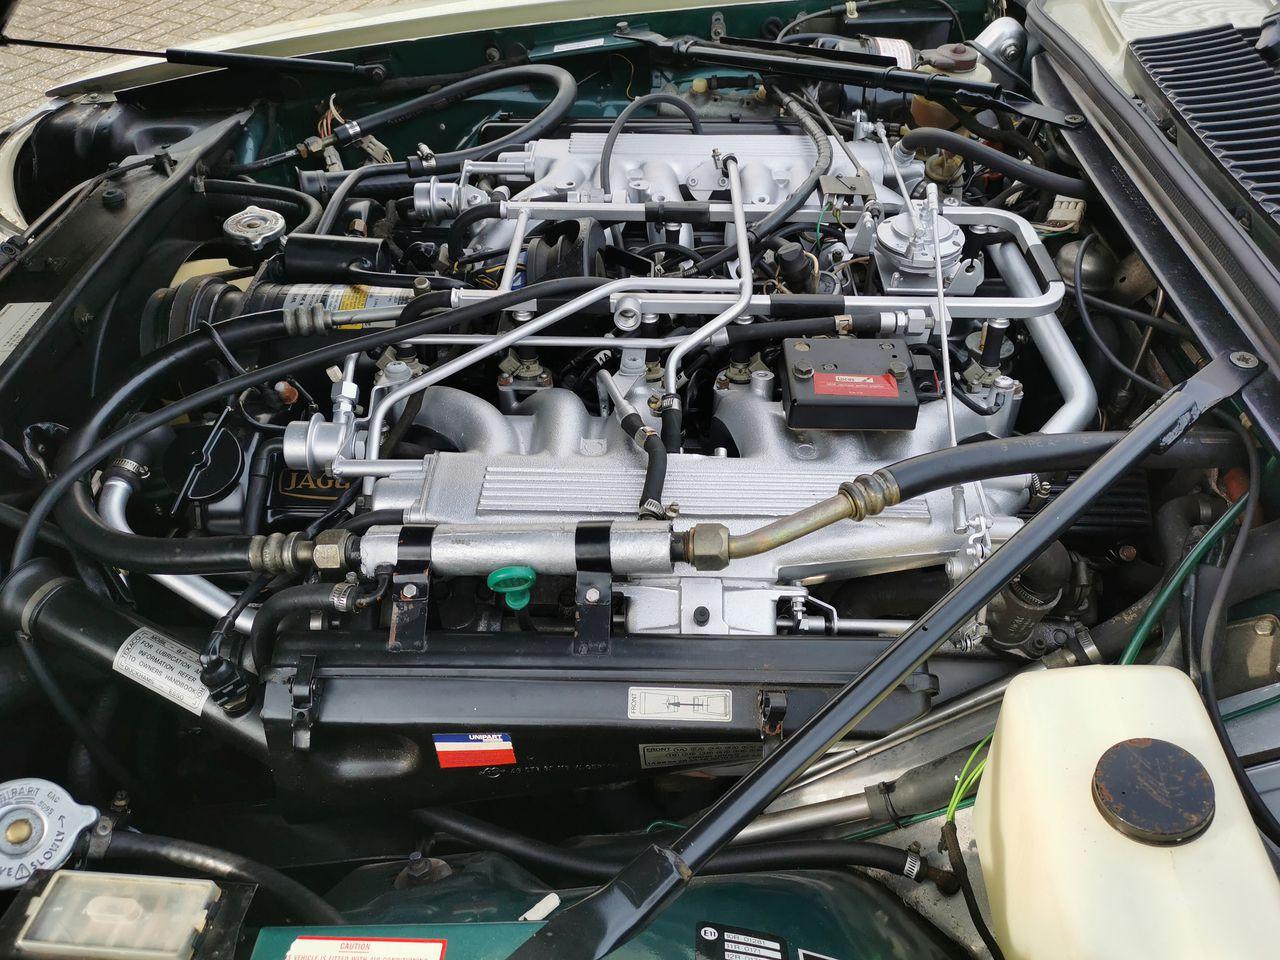 1983 Lynx Eventer engine